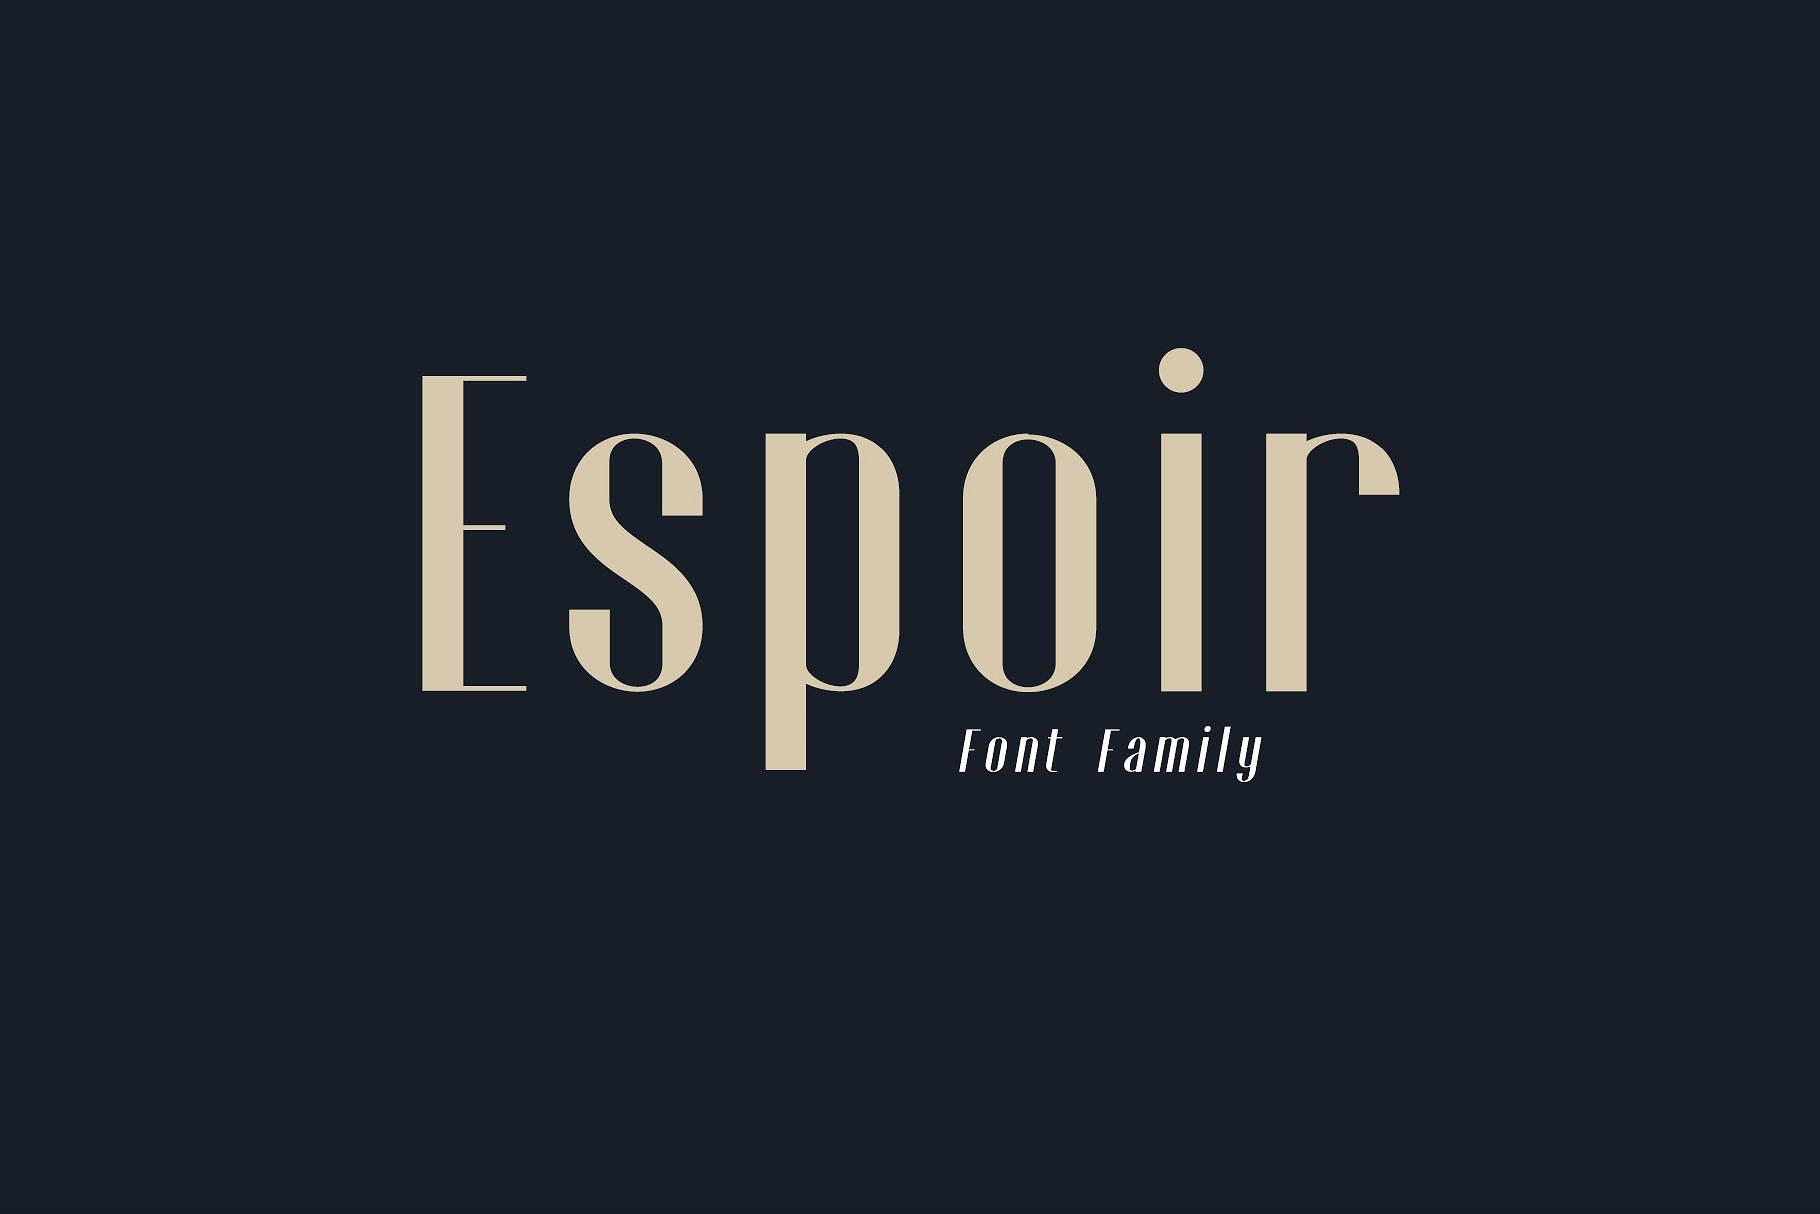 Espoir现代简约时尚海报logo英文字体下载